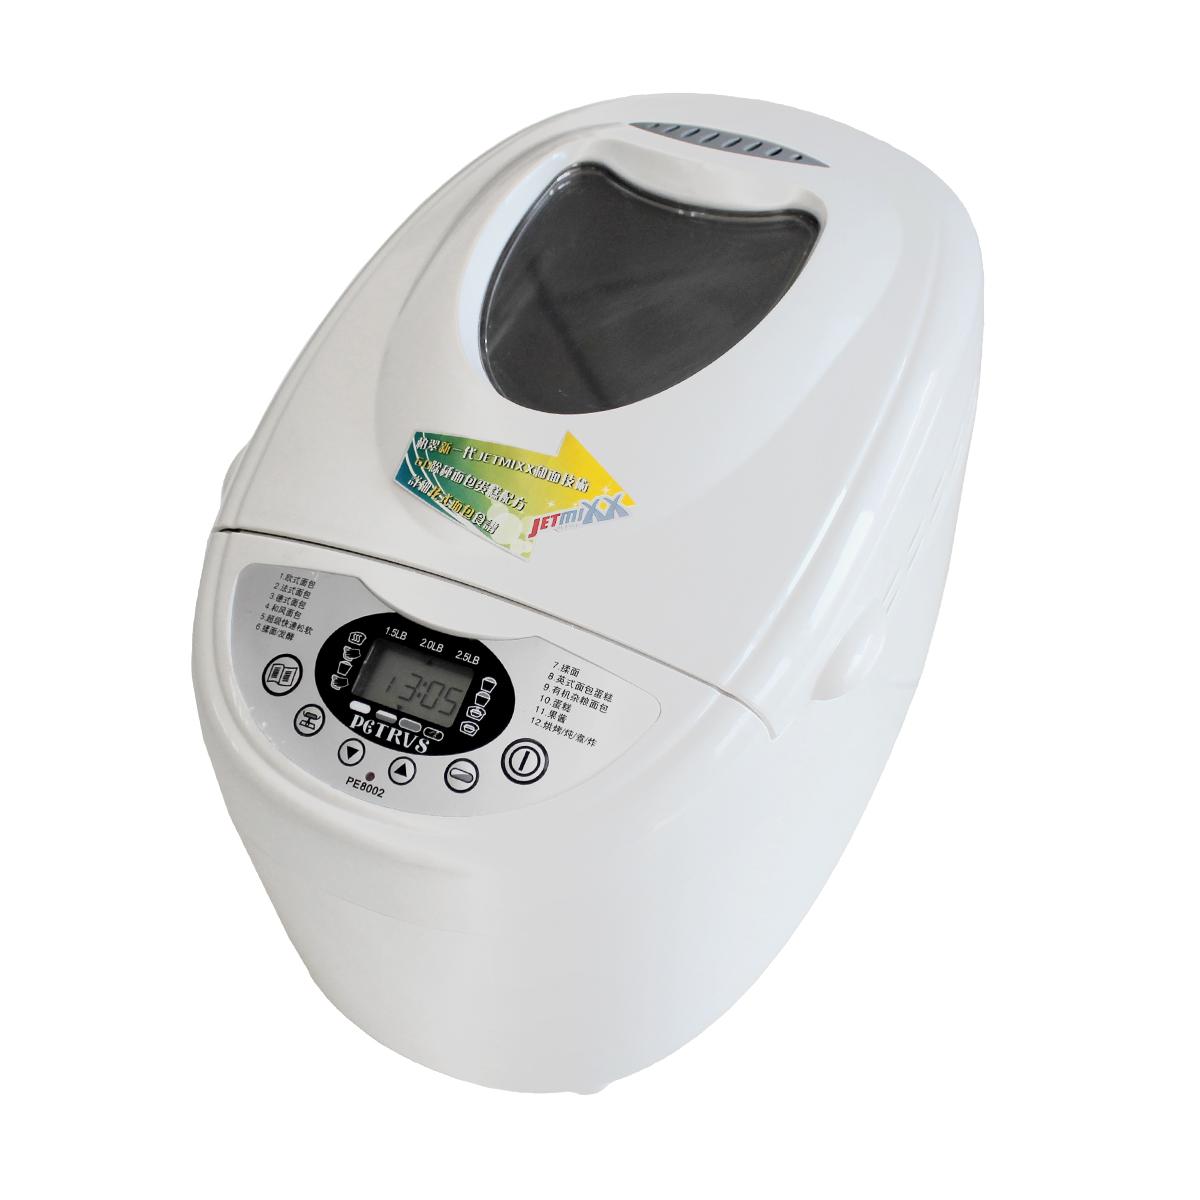 Petrus-柏翠 PE8002家用全自动面包机大容量双搅拌刀多功能智能